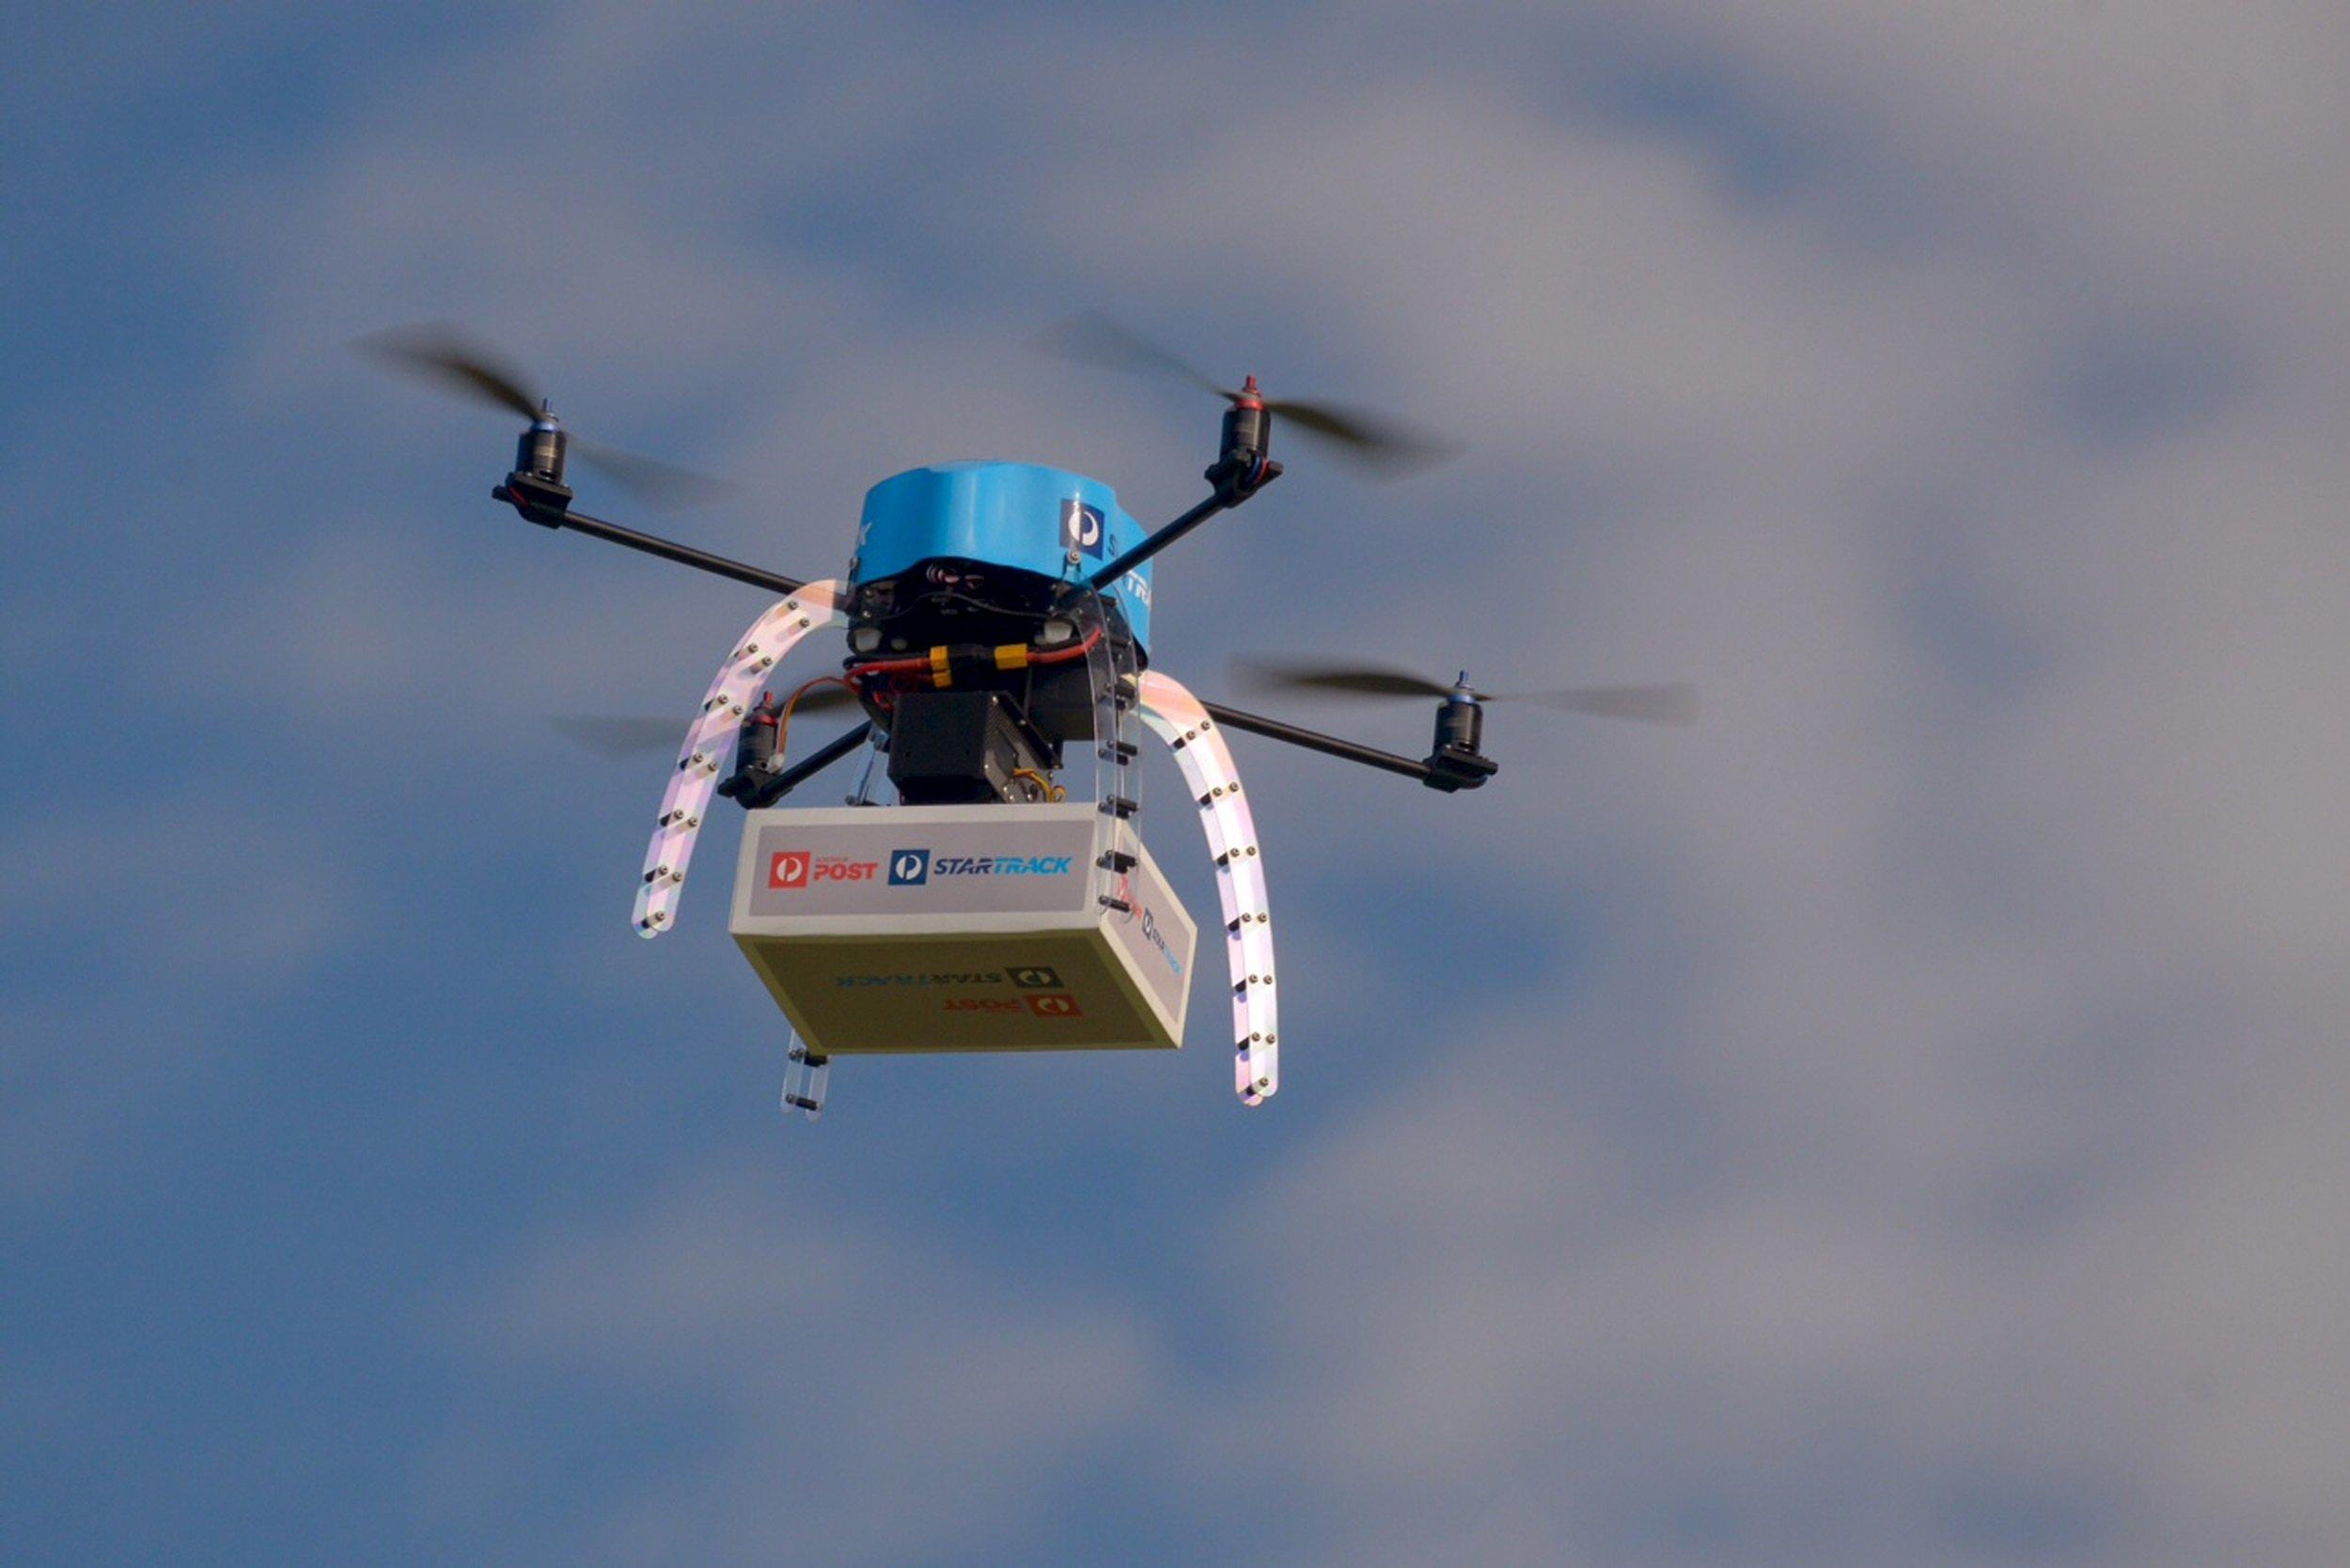 drones-post-australia-drone-delivery.jpg